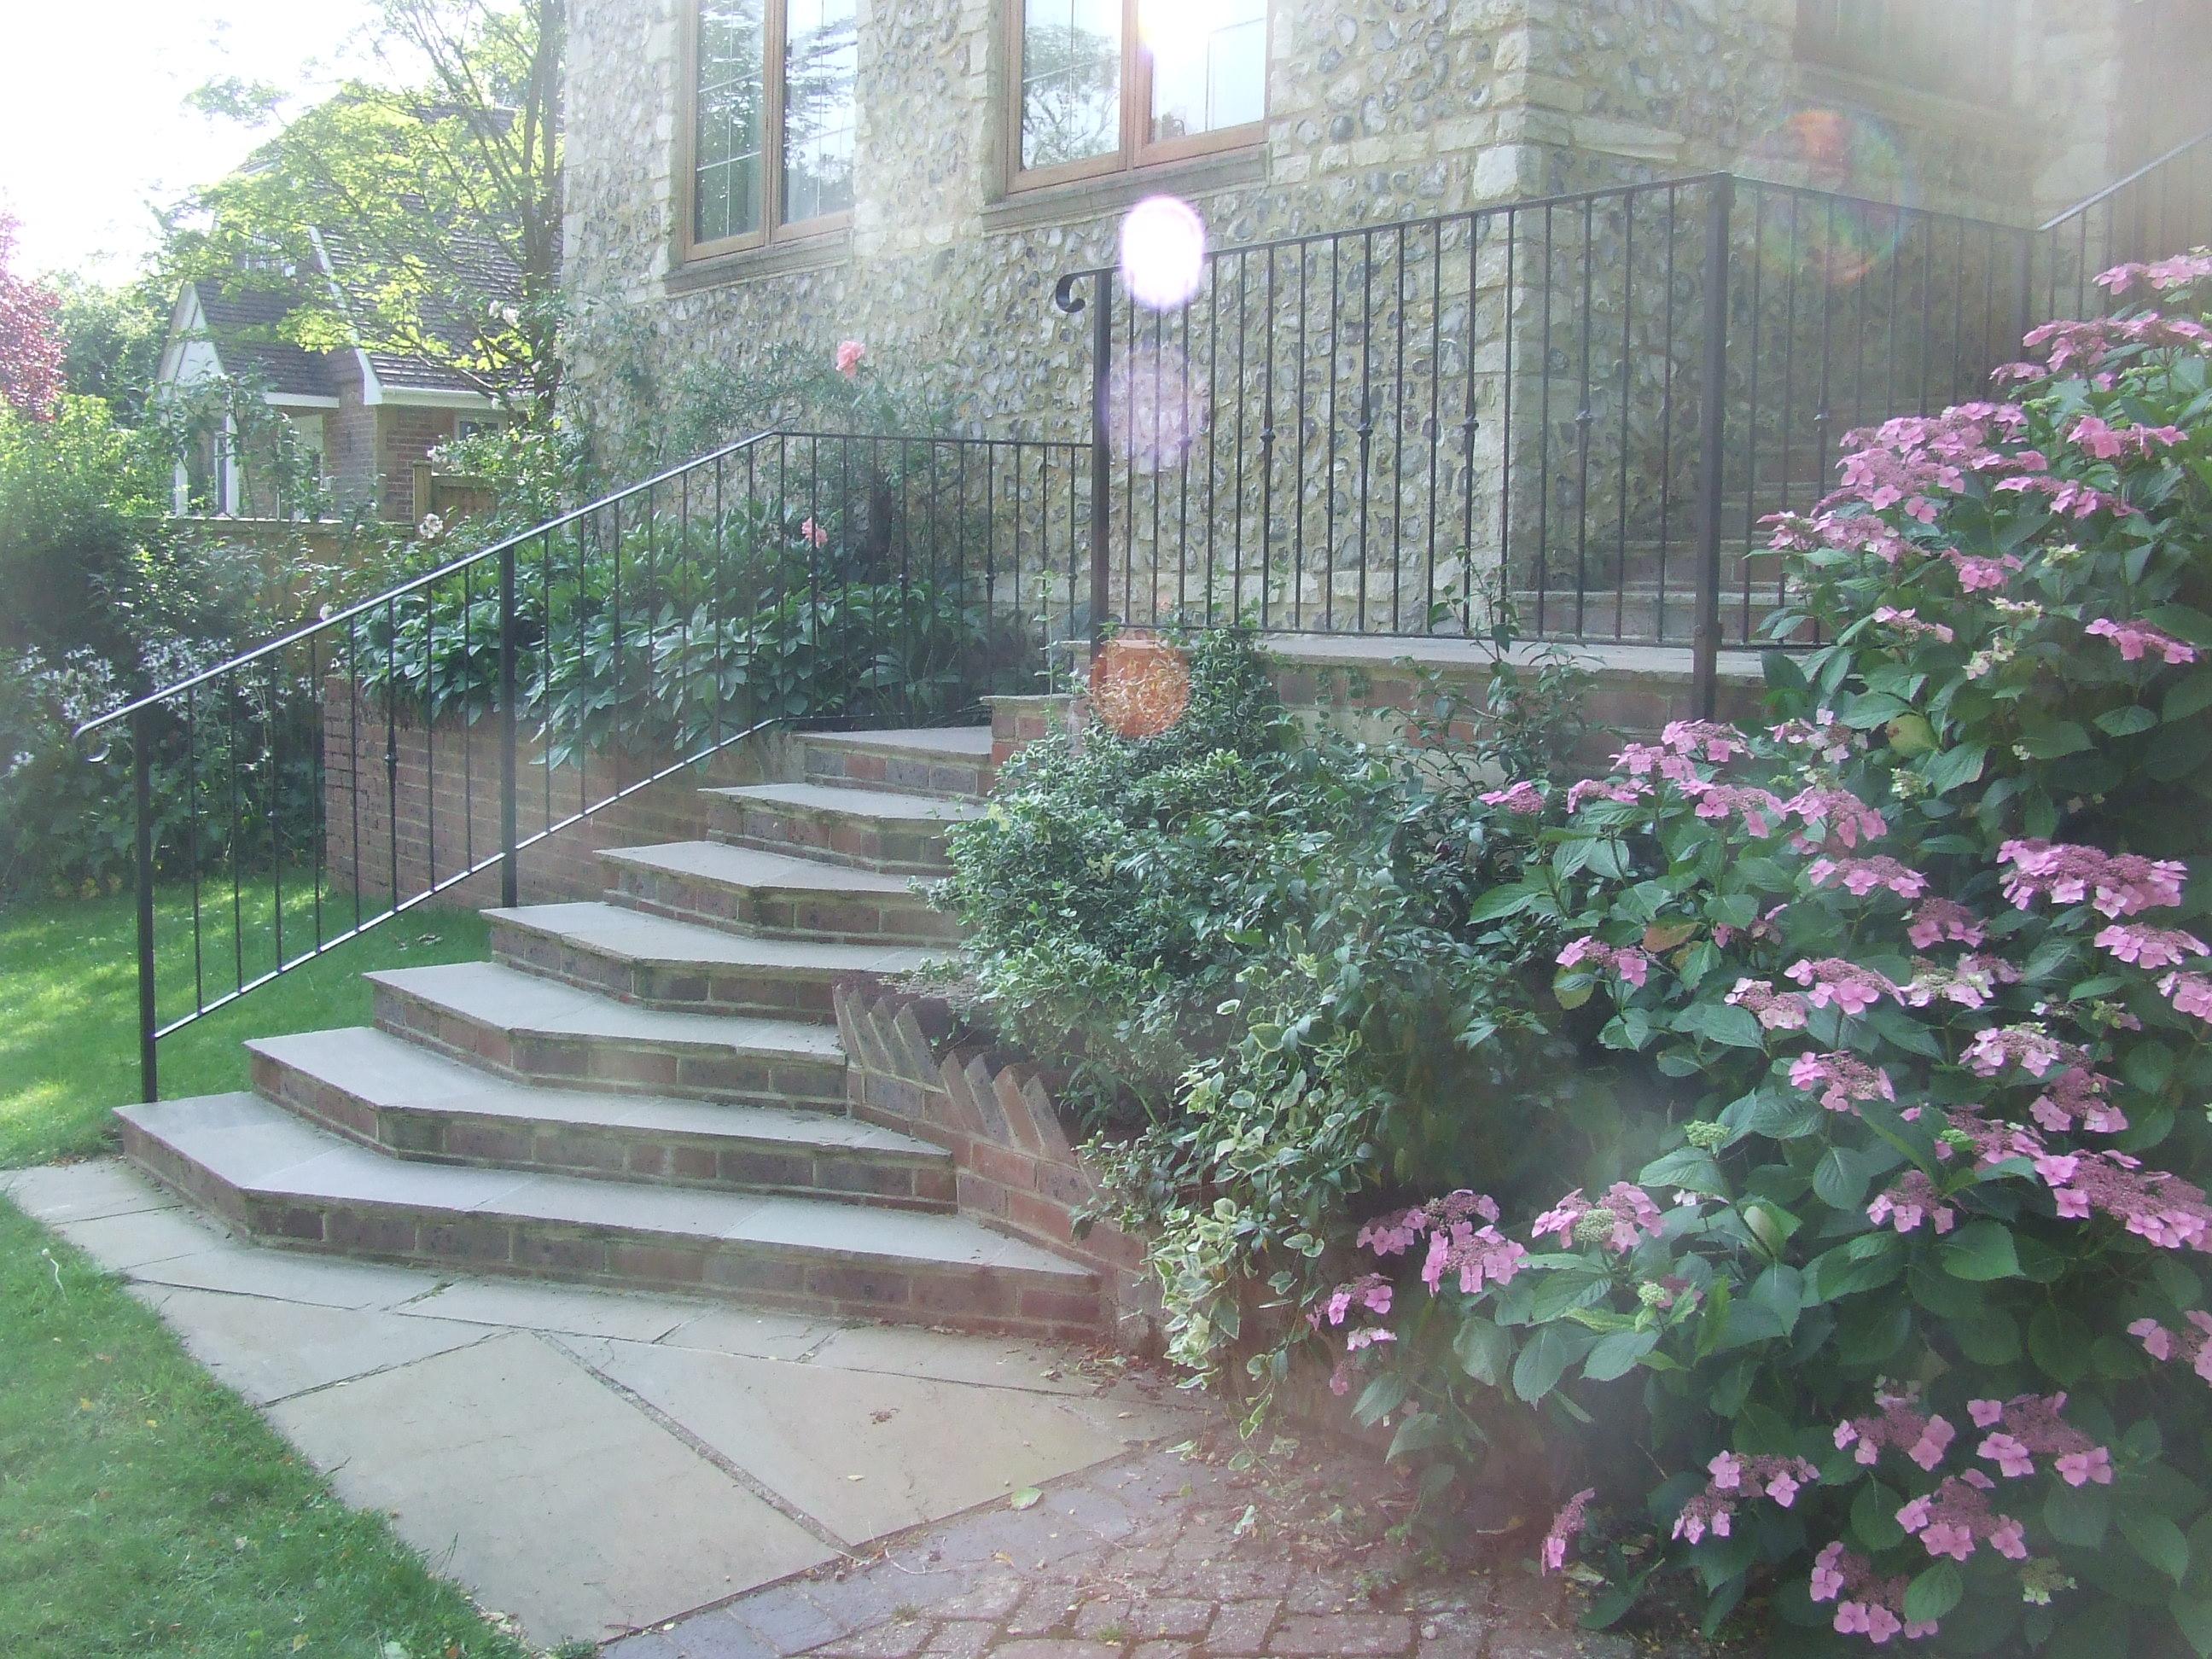 Garden railing and stair hand rail